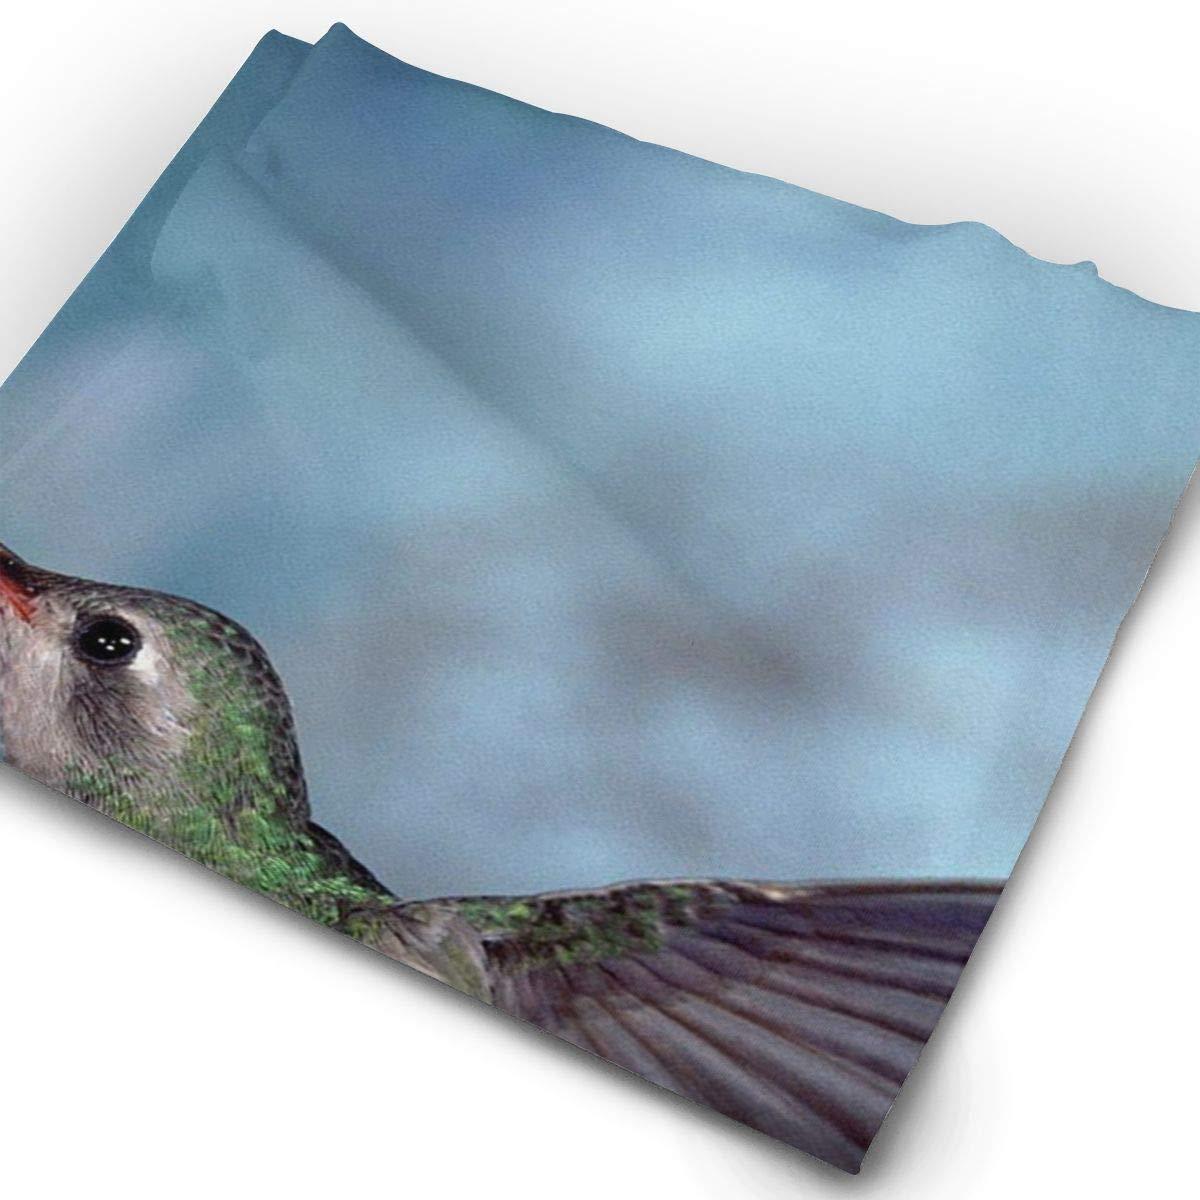 Headbands Hummingbird Headwear Bandana Sweatband Gaiter Head Wrap Mask Neck Outdoor Scarf